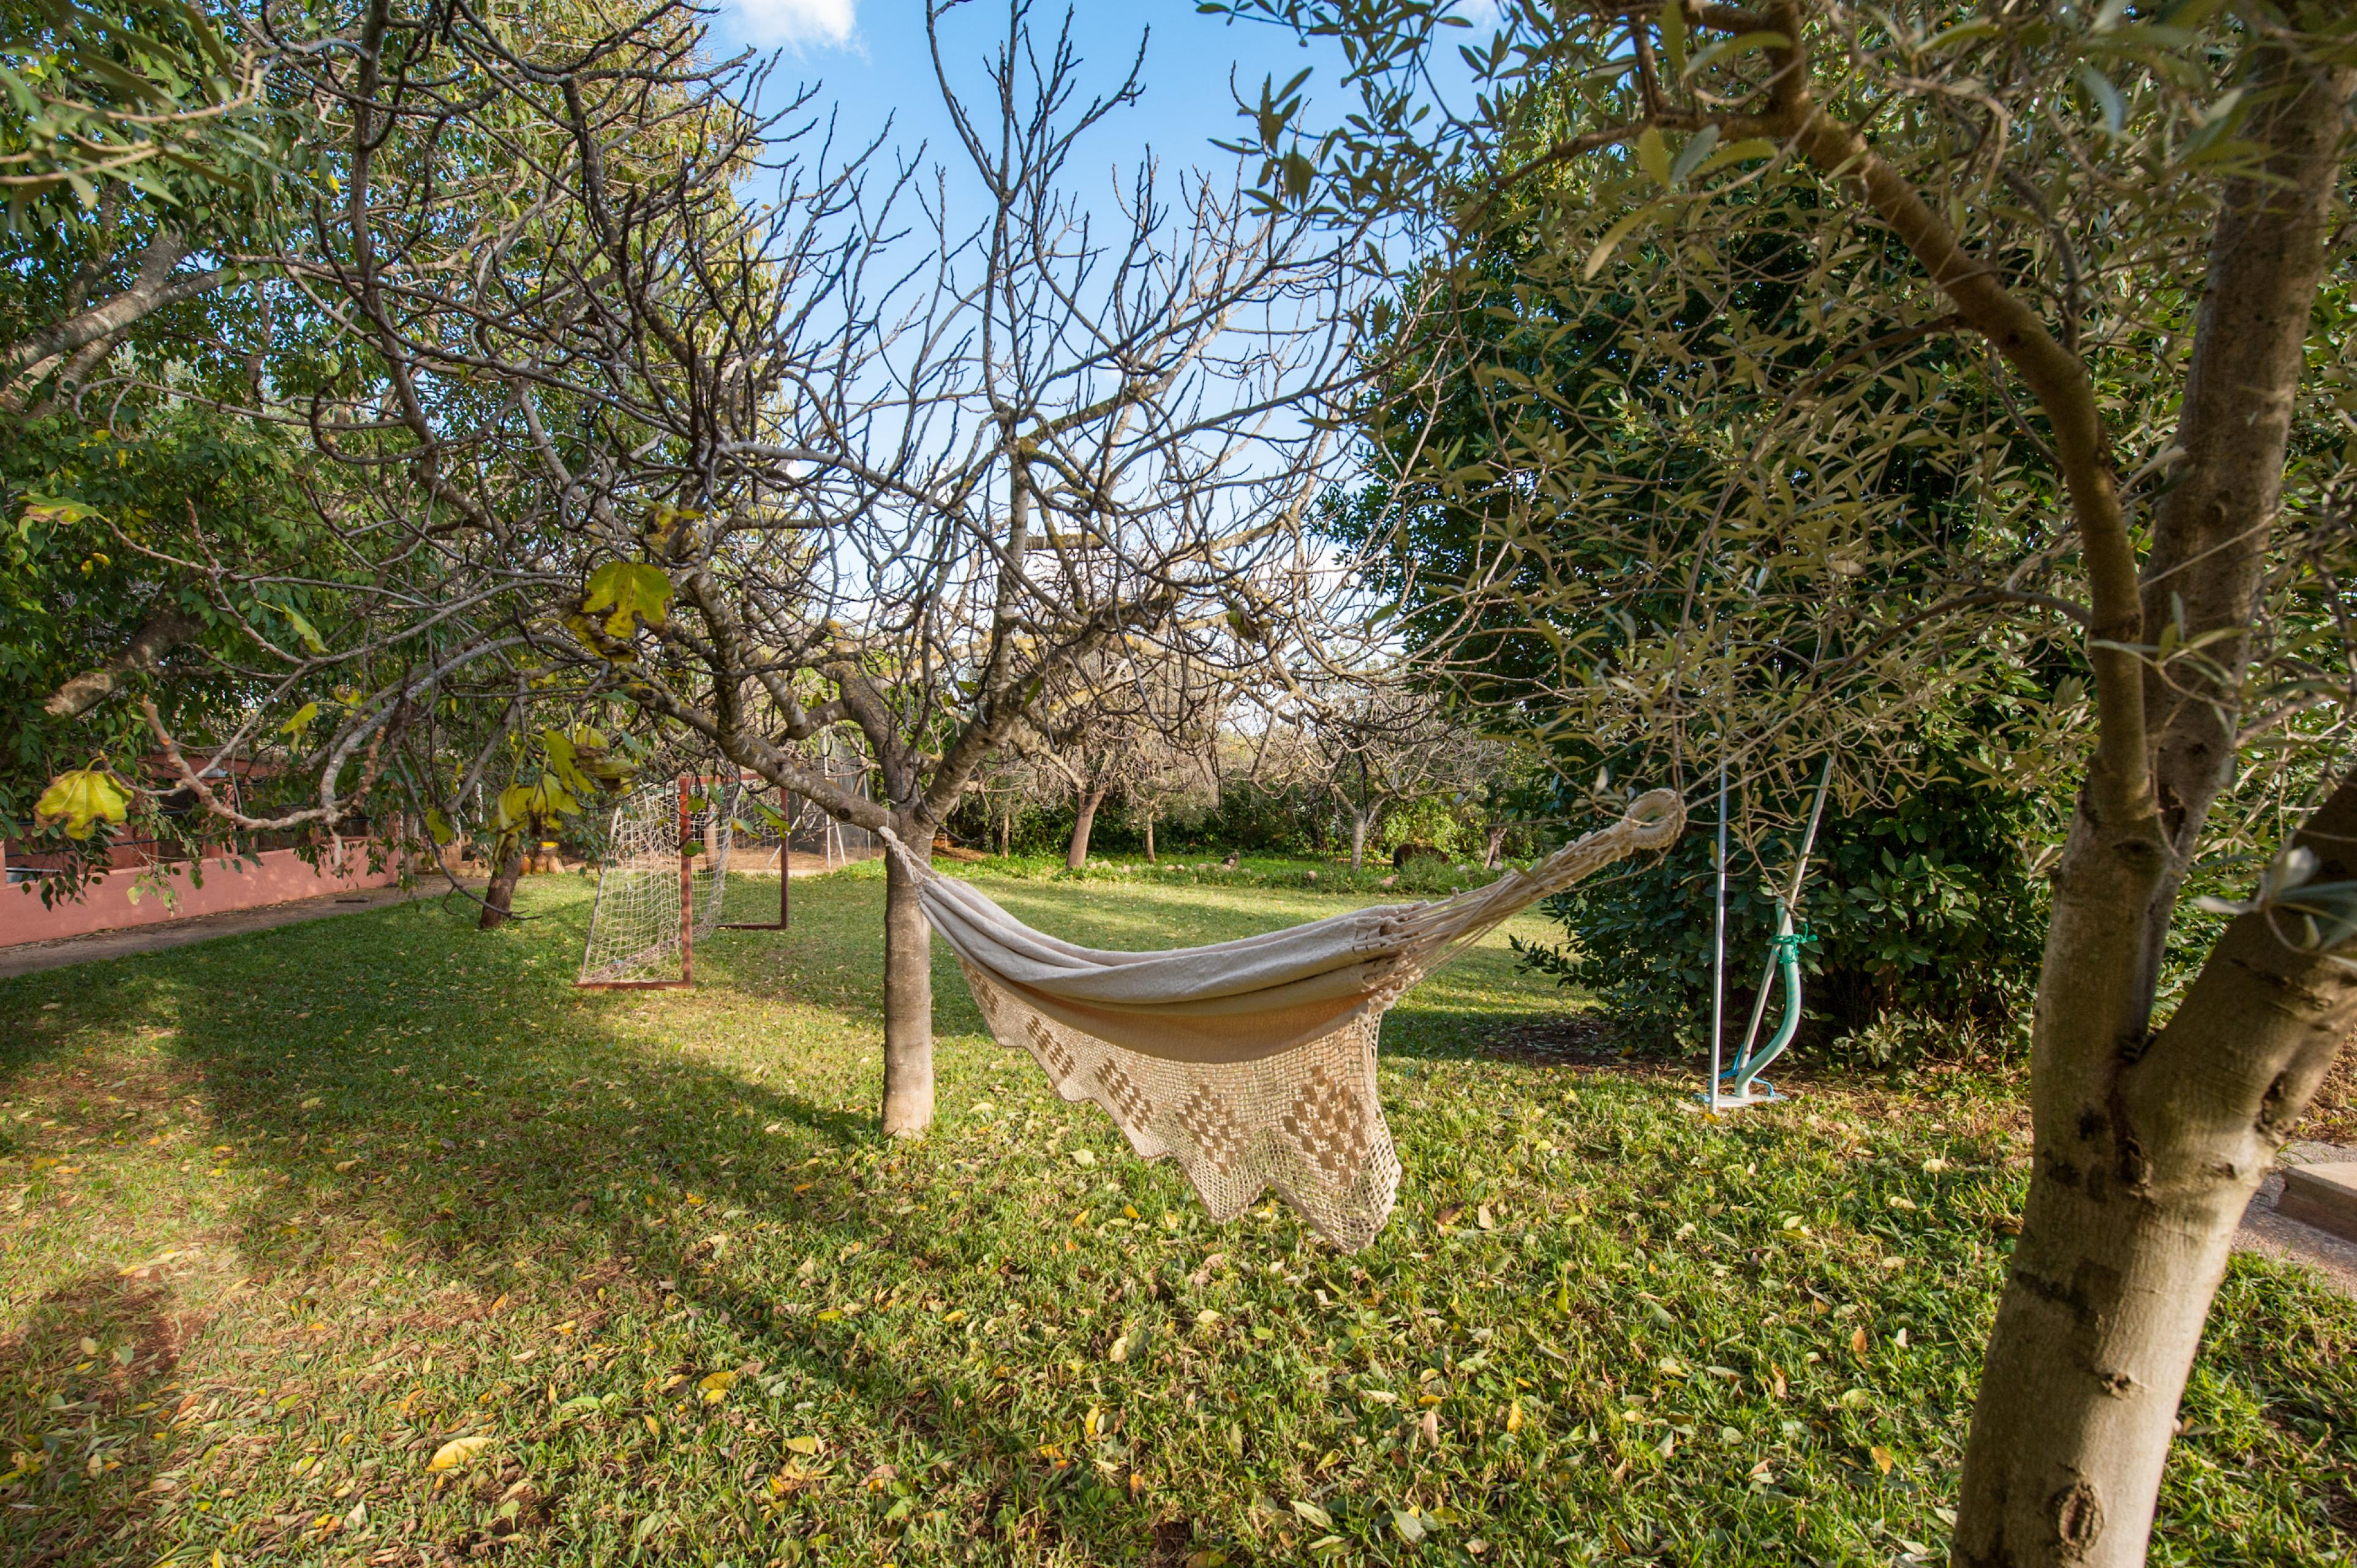 Maison de vacances CA'N LLUC- Alaró- MALLORCA - Kostenloses WLAN (2687507), Alaro, Majorque, Iles Baléares, Espagne, image 41